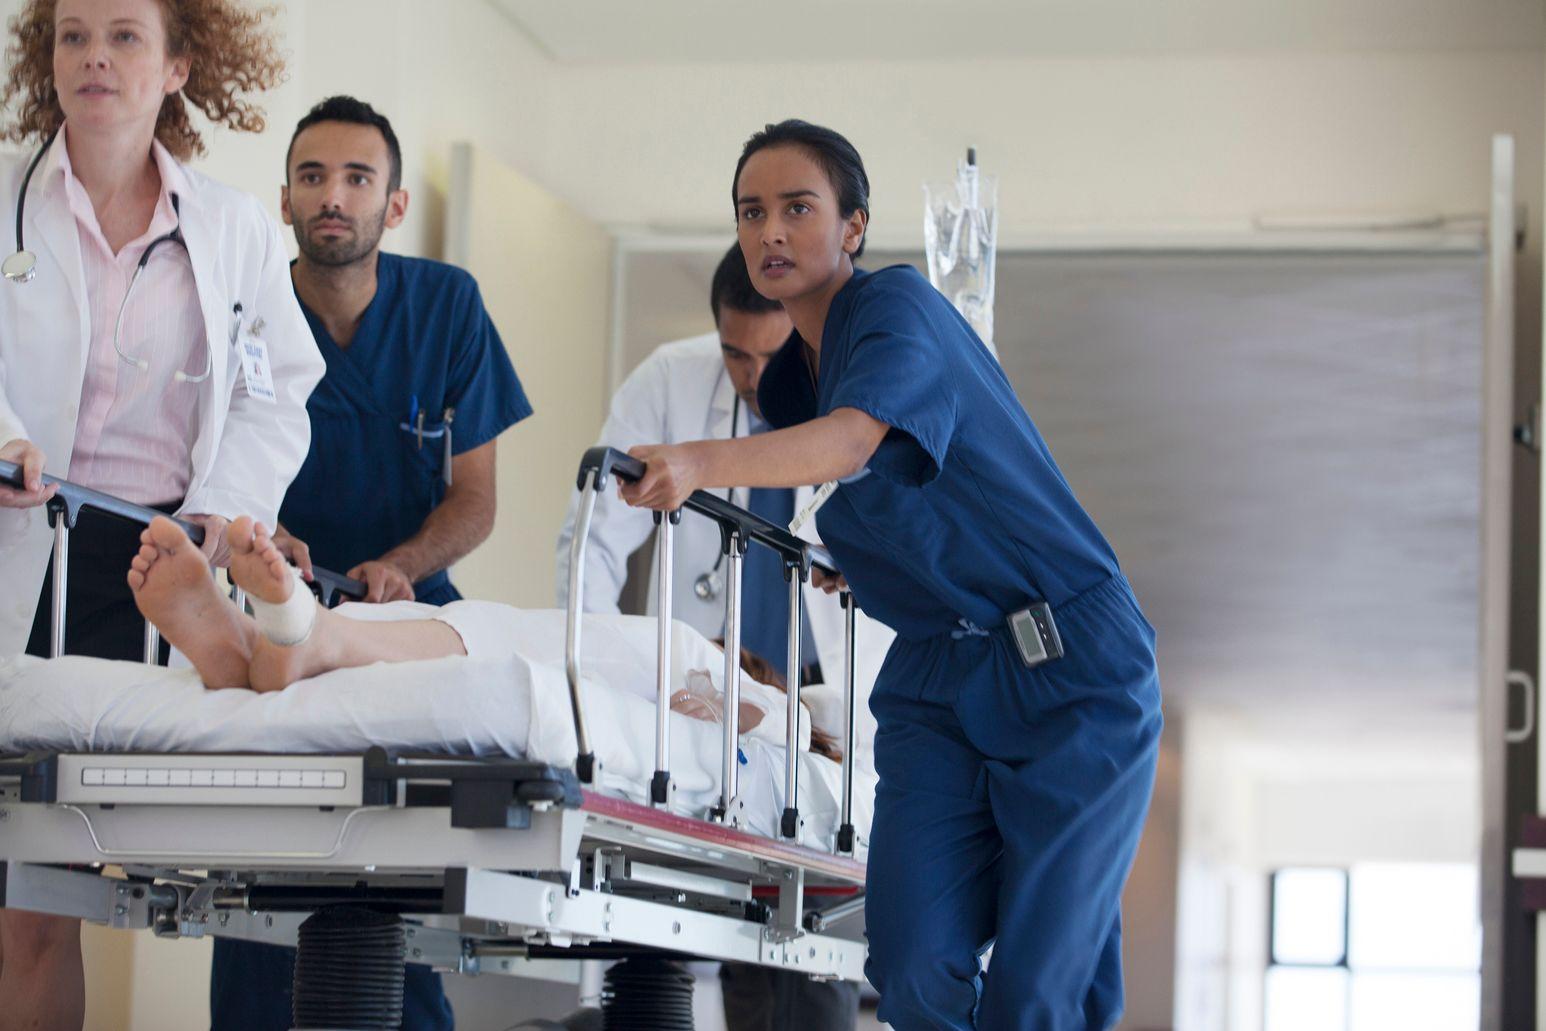 Five challenges facing emergency medicine | Northwell Health